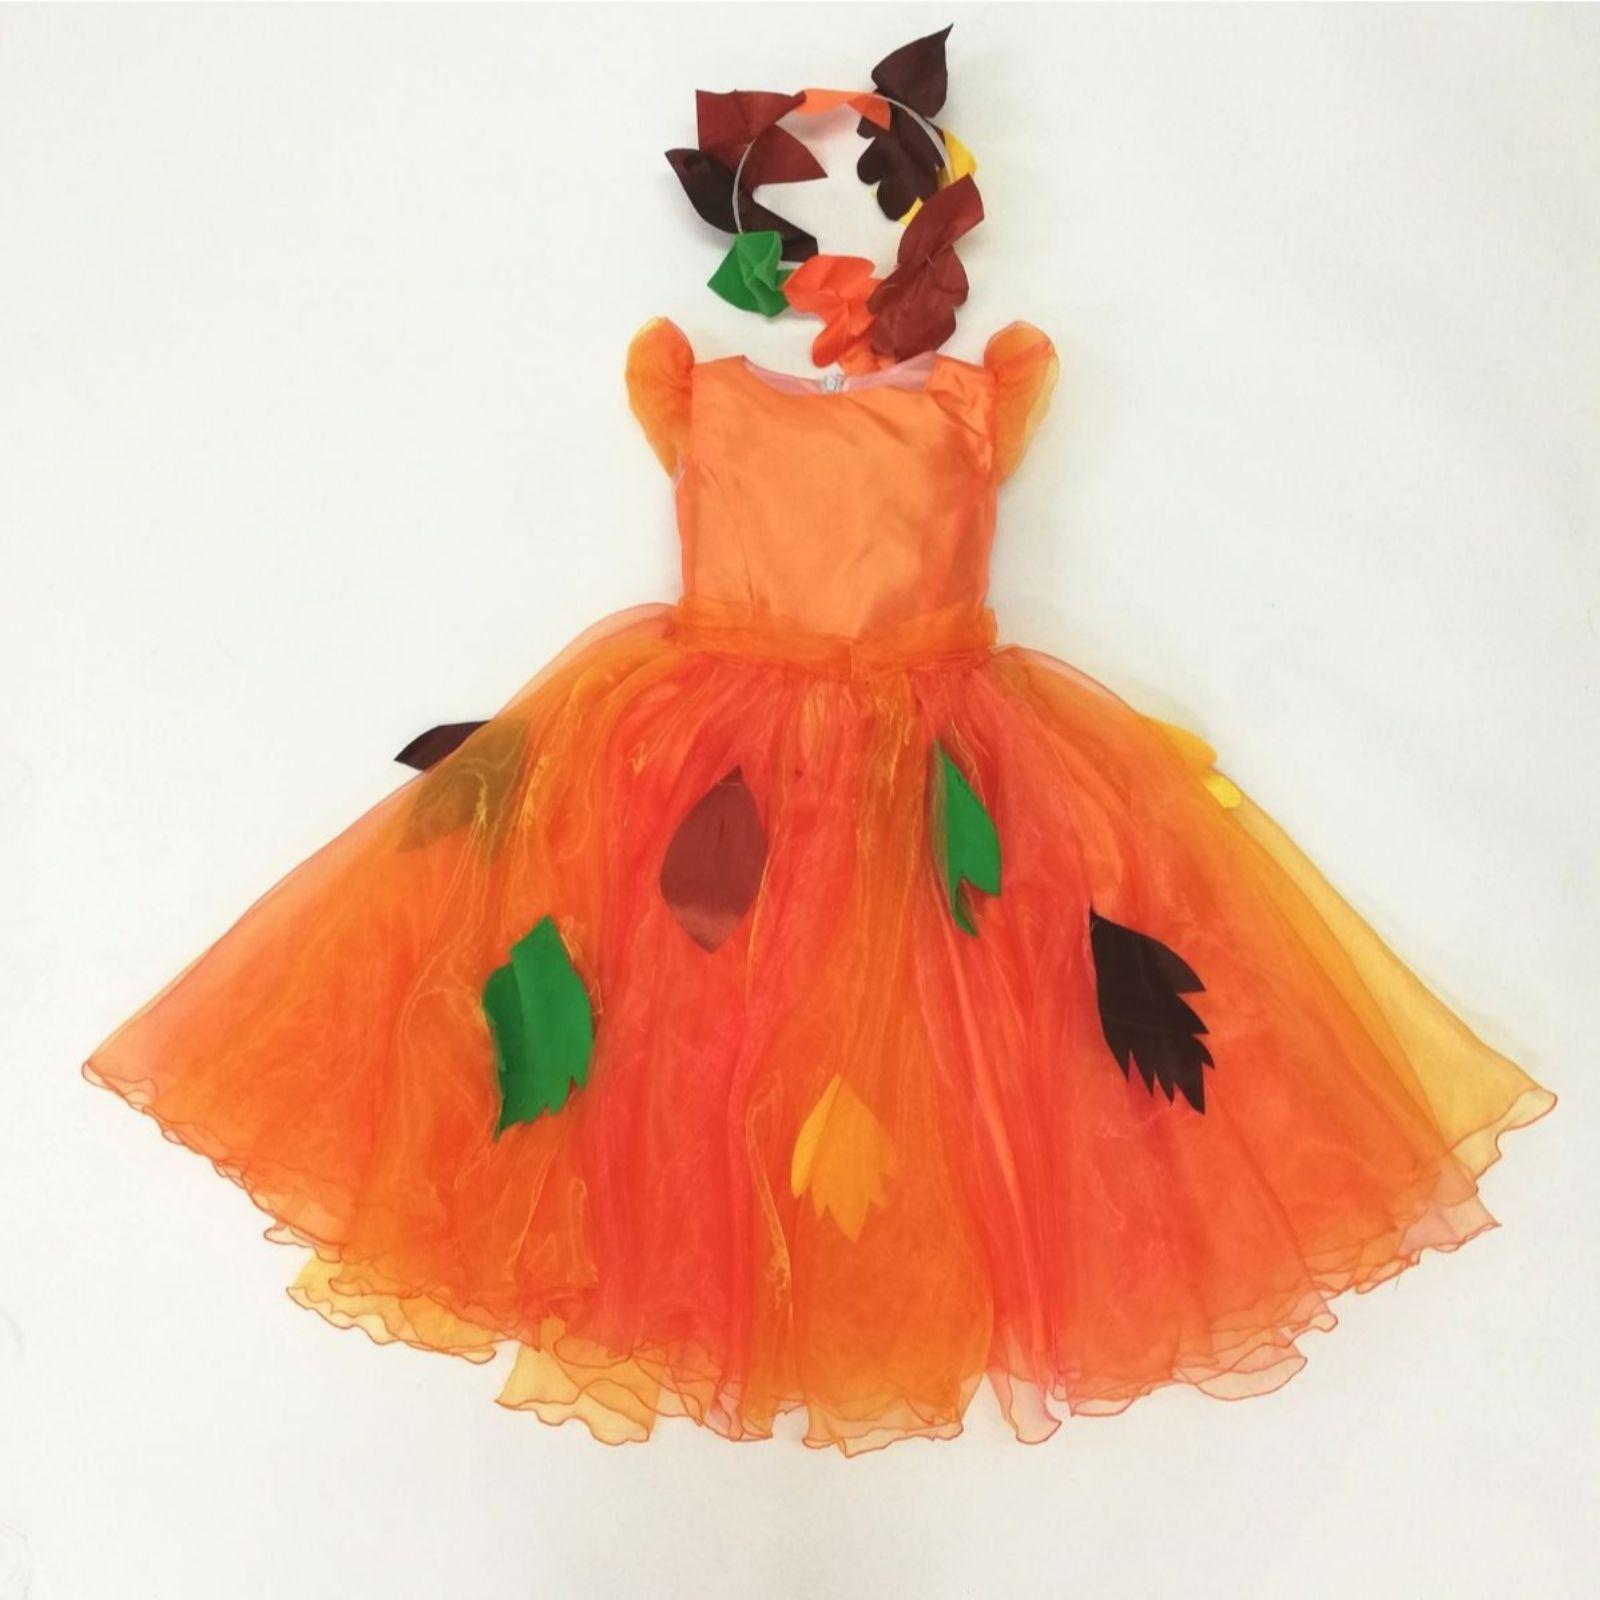 Rochița Zâna Toamnă portocaliu 1